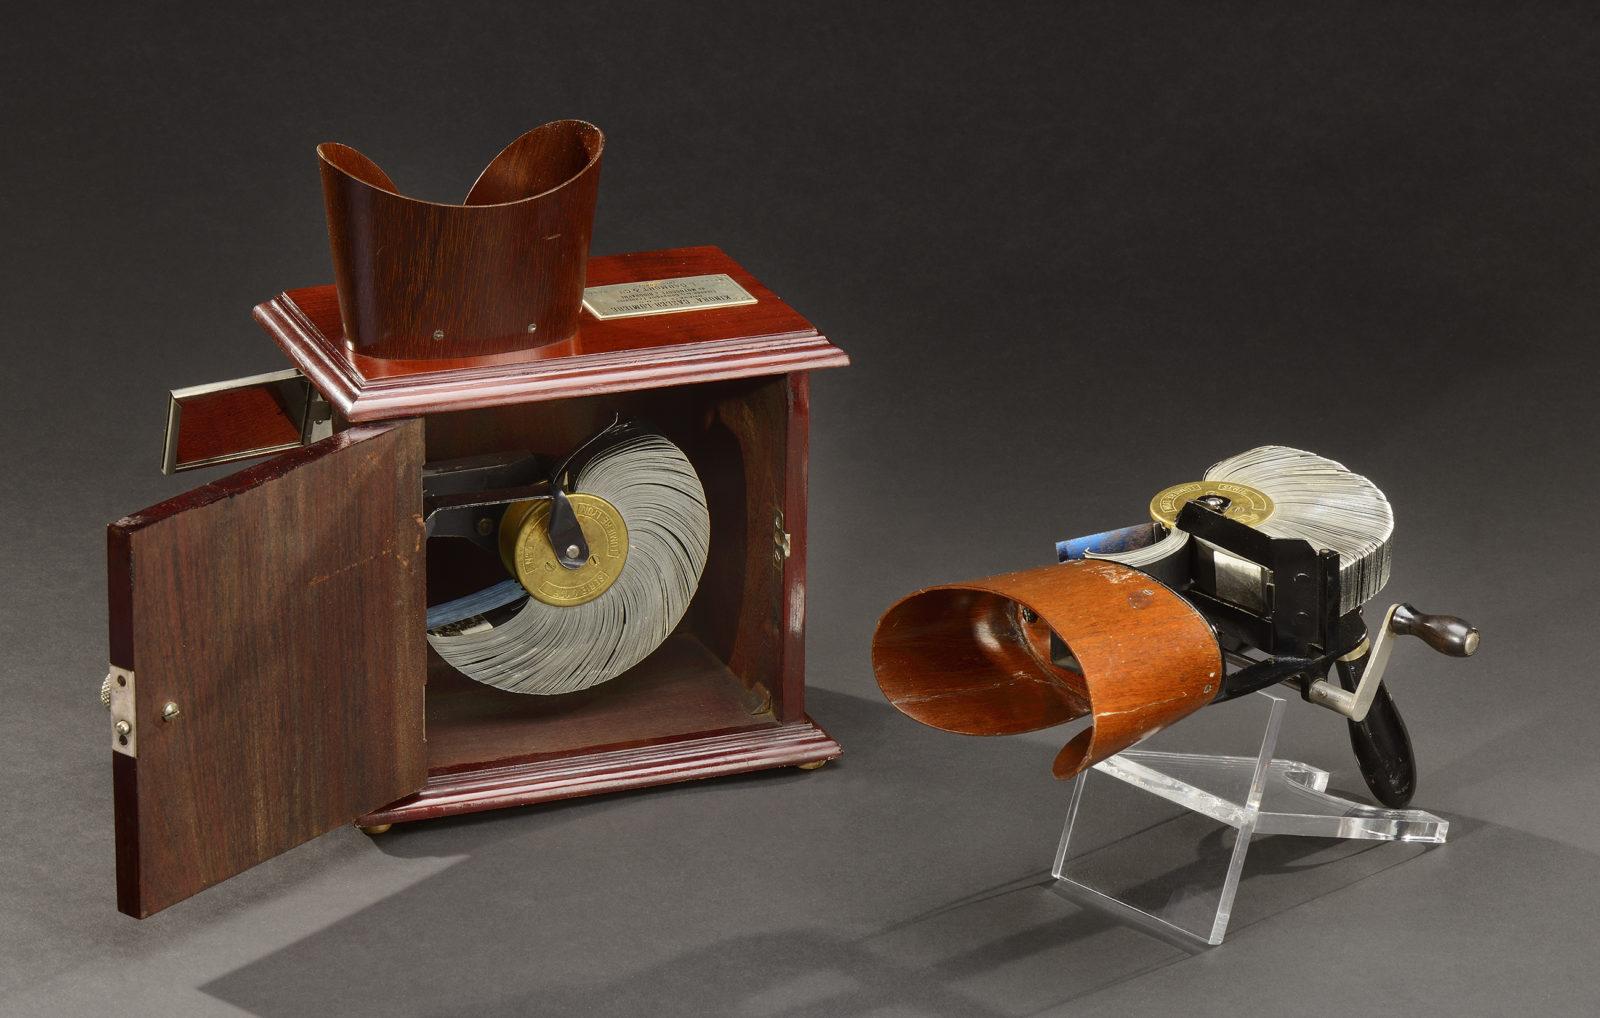 Kinora de salon 1900 et à main 1910